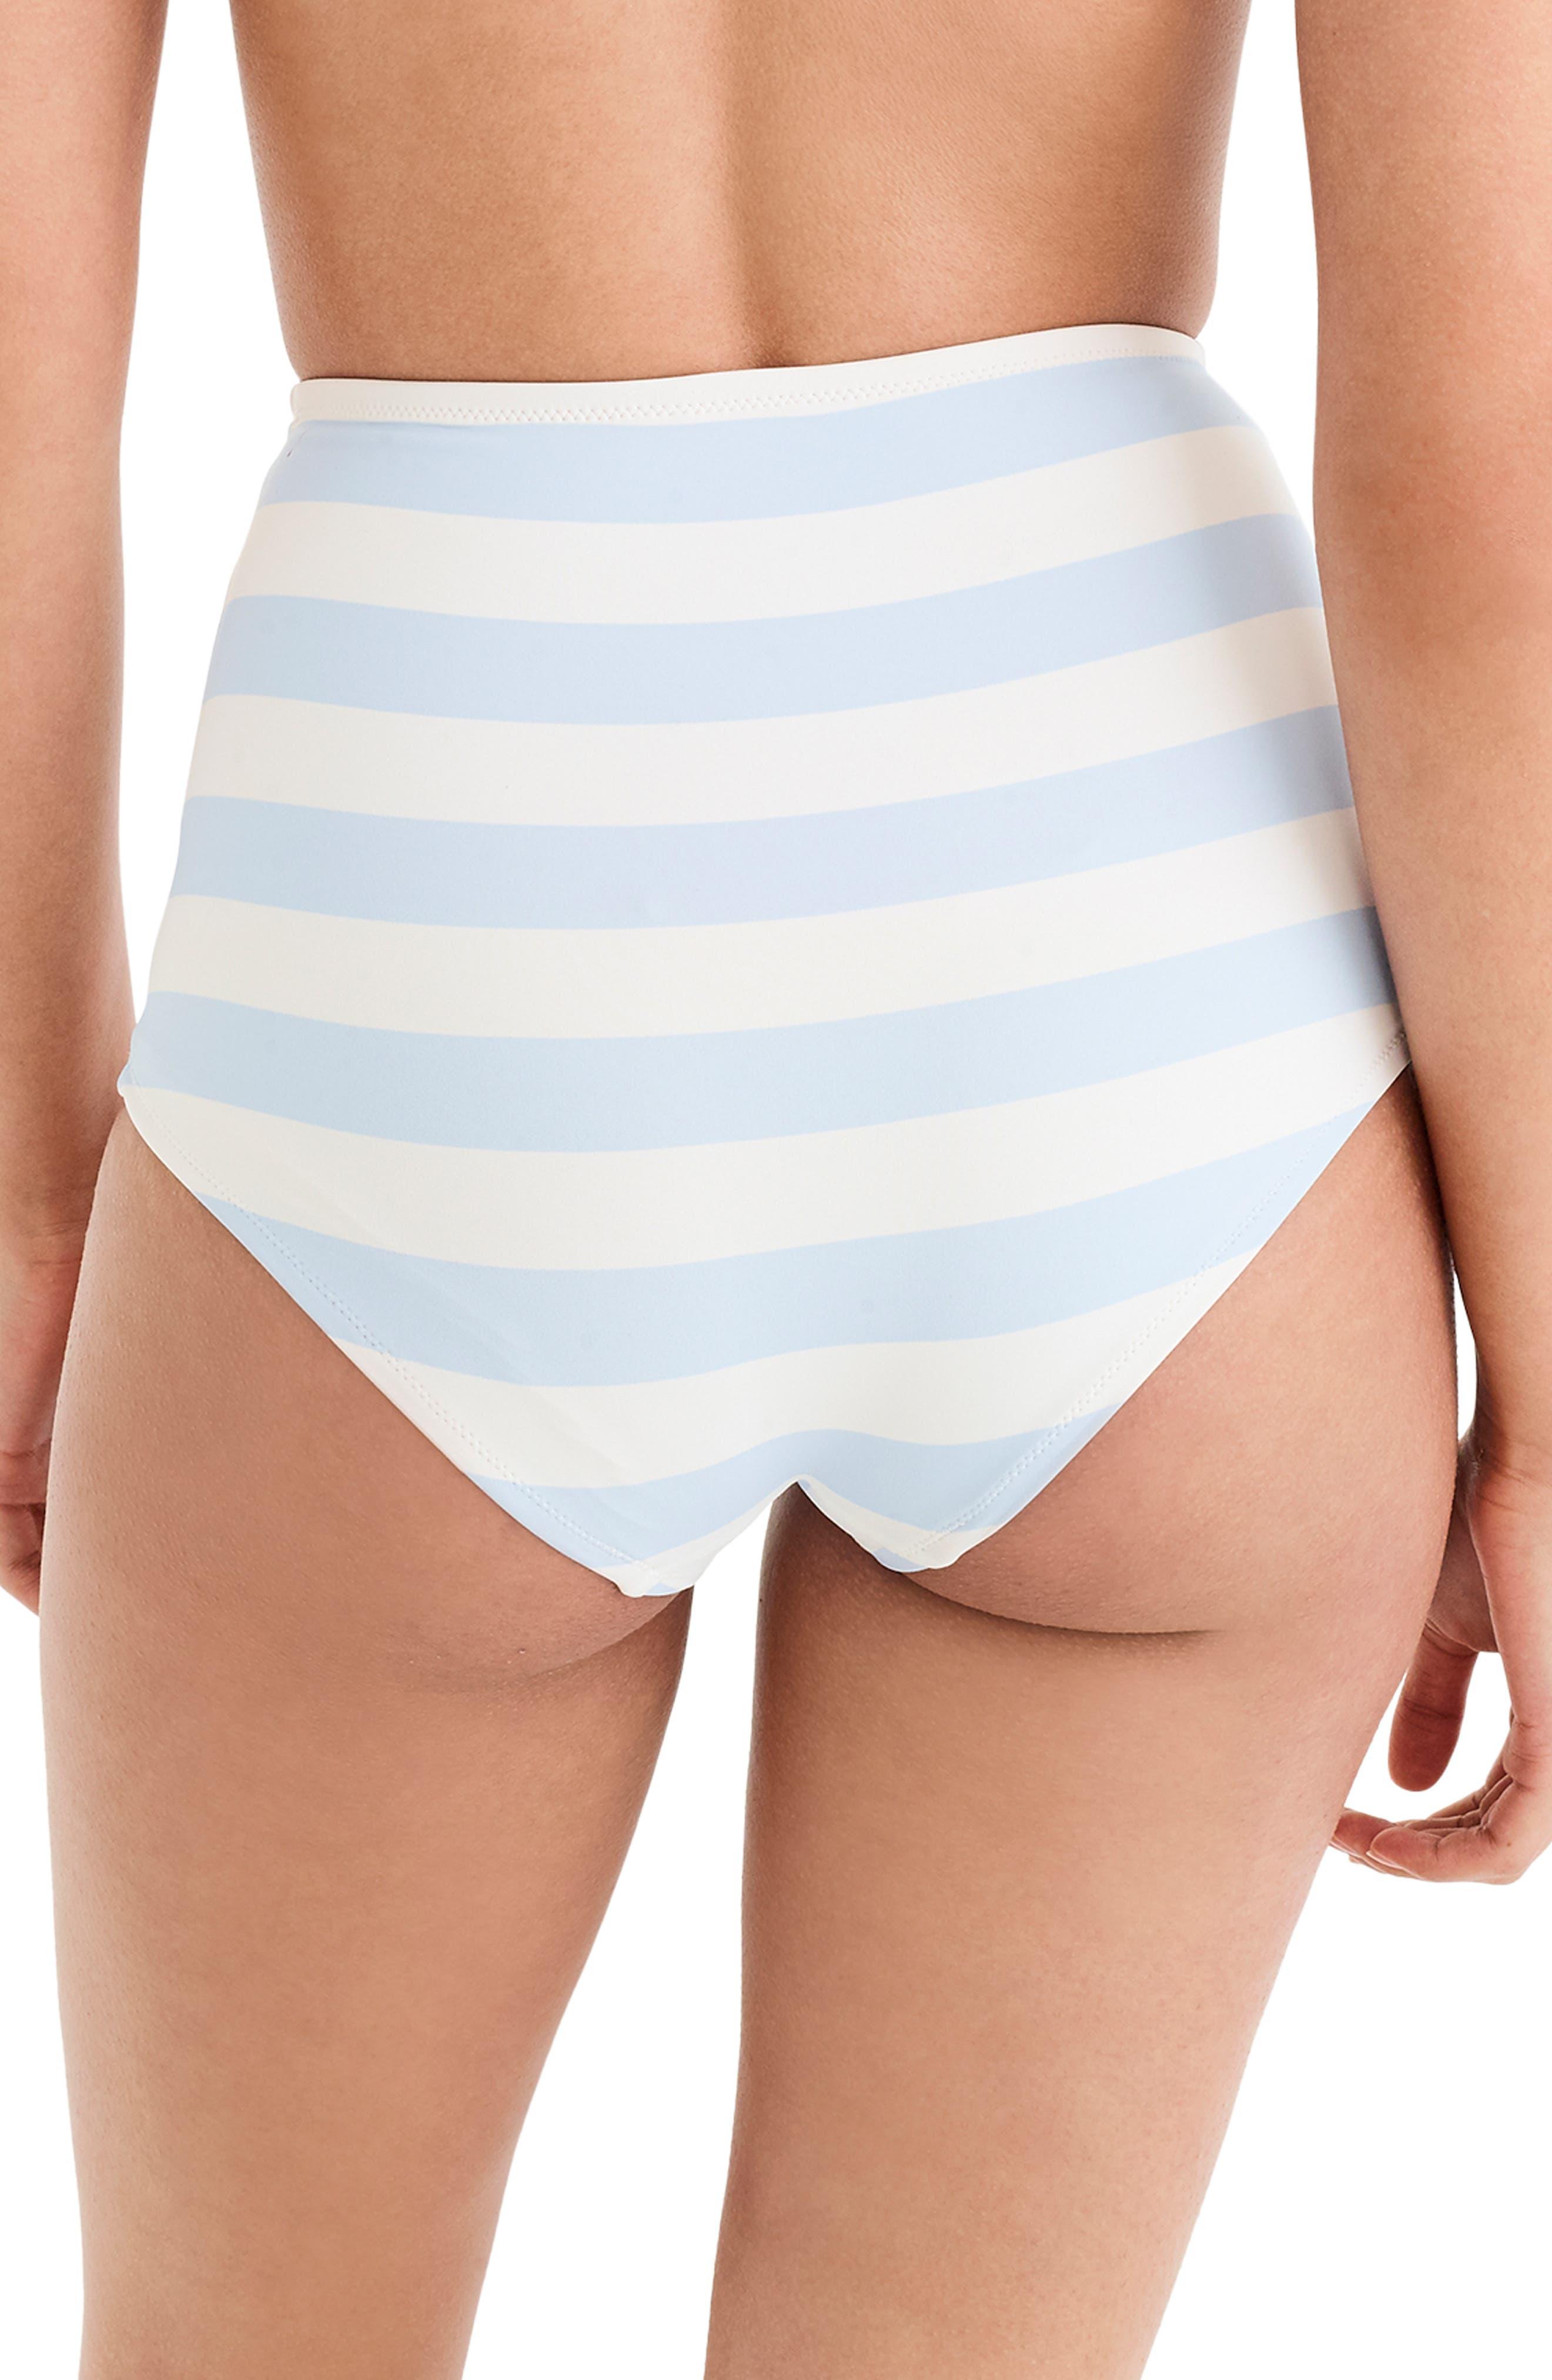 J.CREW, Stripe Seamless High Waist Bikini Bottoms, Alternate thumbnail 2, color, 400